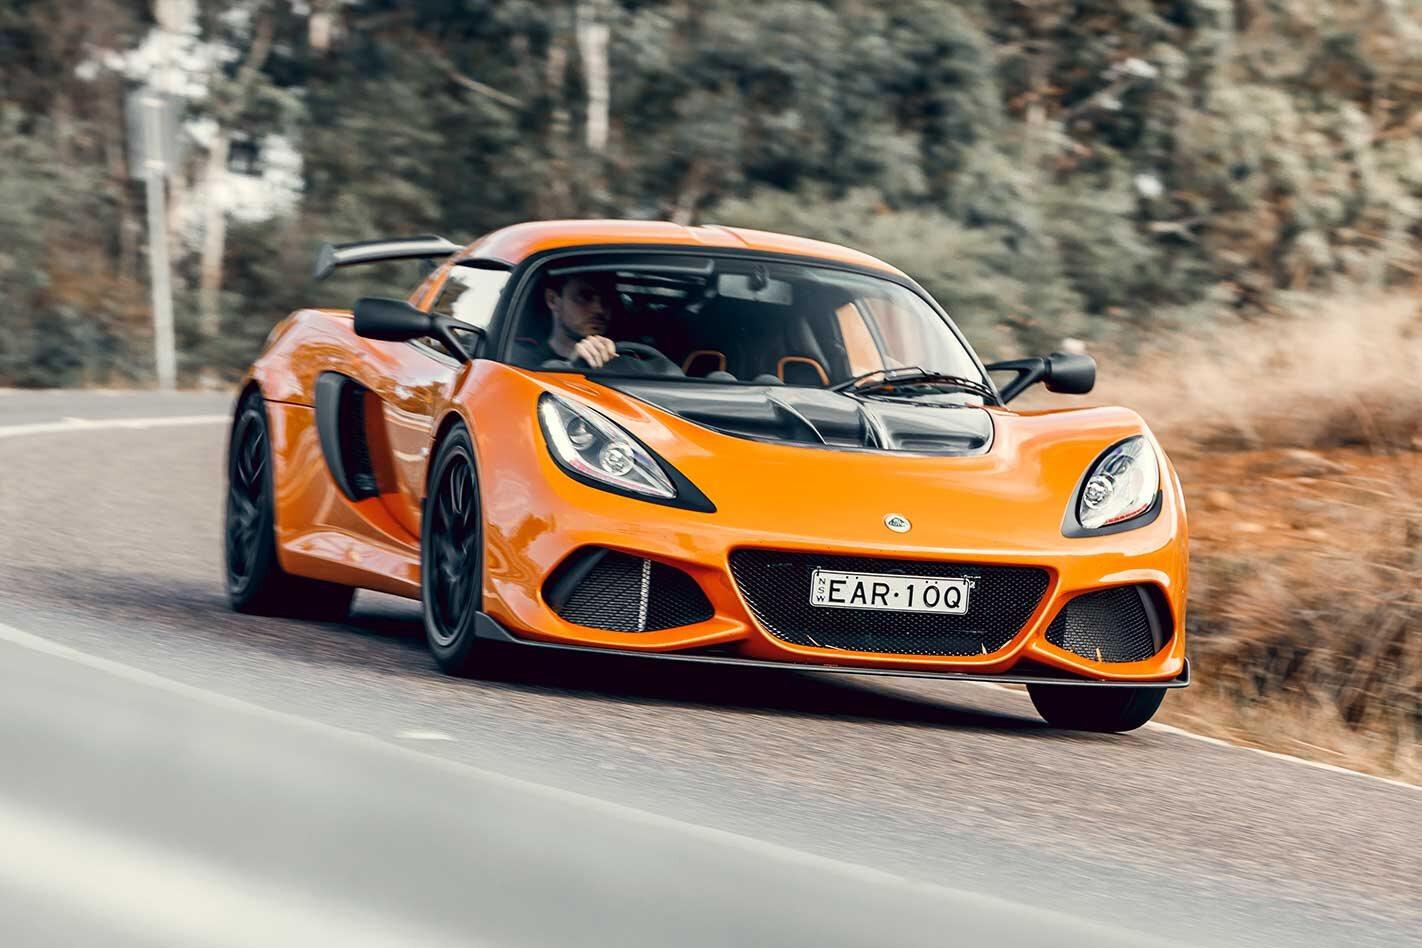 2019 Lotus Exige Sport 410 performance review